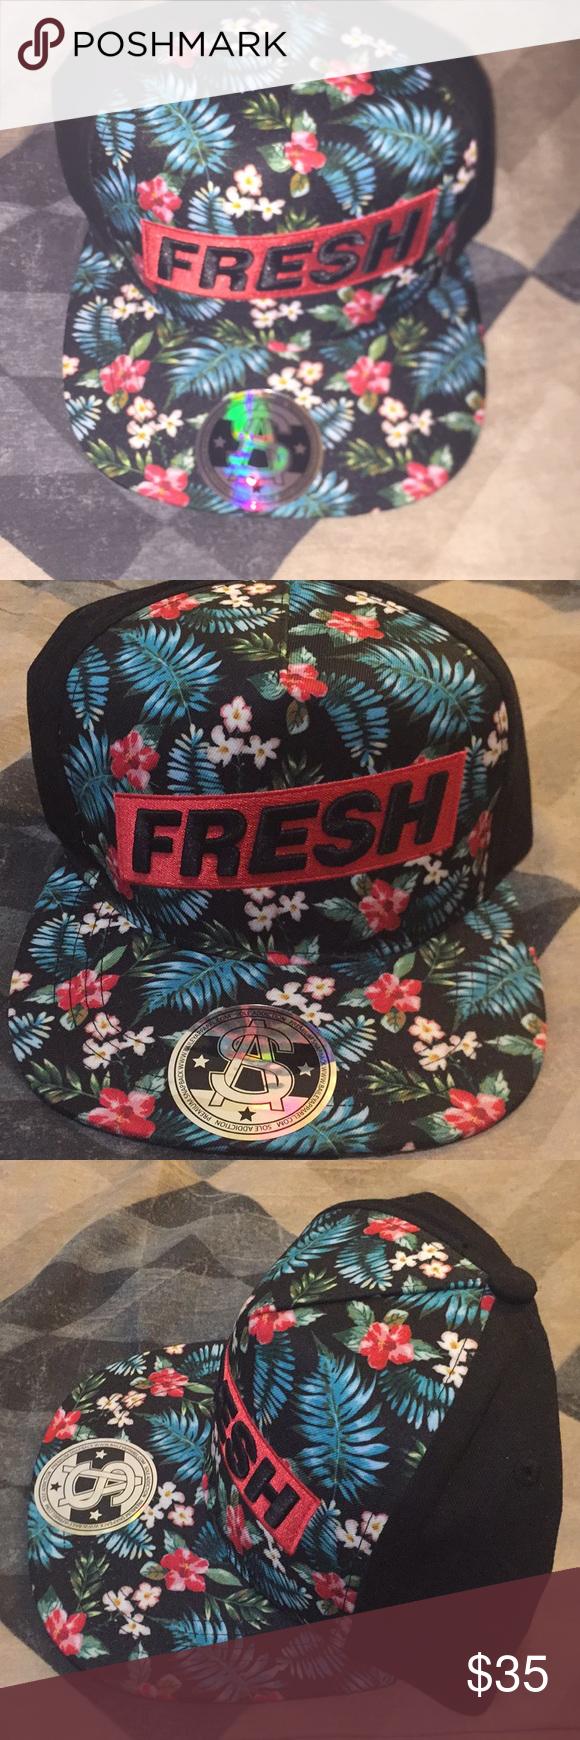 8d295d78681 Men s Fresh Floral Snapback (Hat) In very good condition!! Men s Floral  Breeze Hat Floral front Solid Black back Original fit Red White Black Blue   Green ...